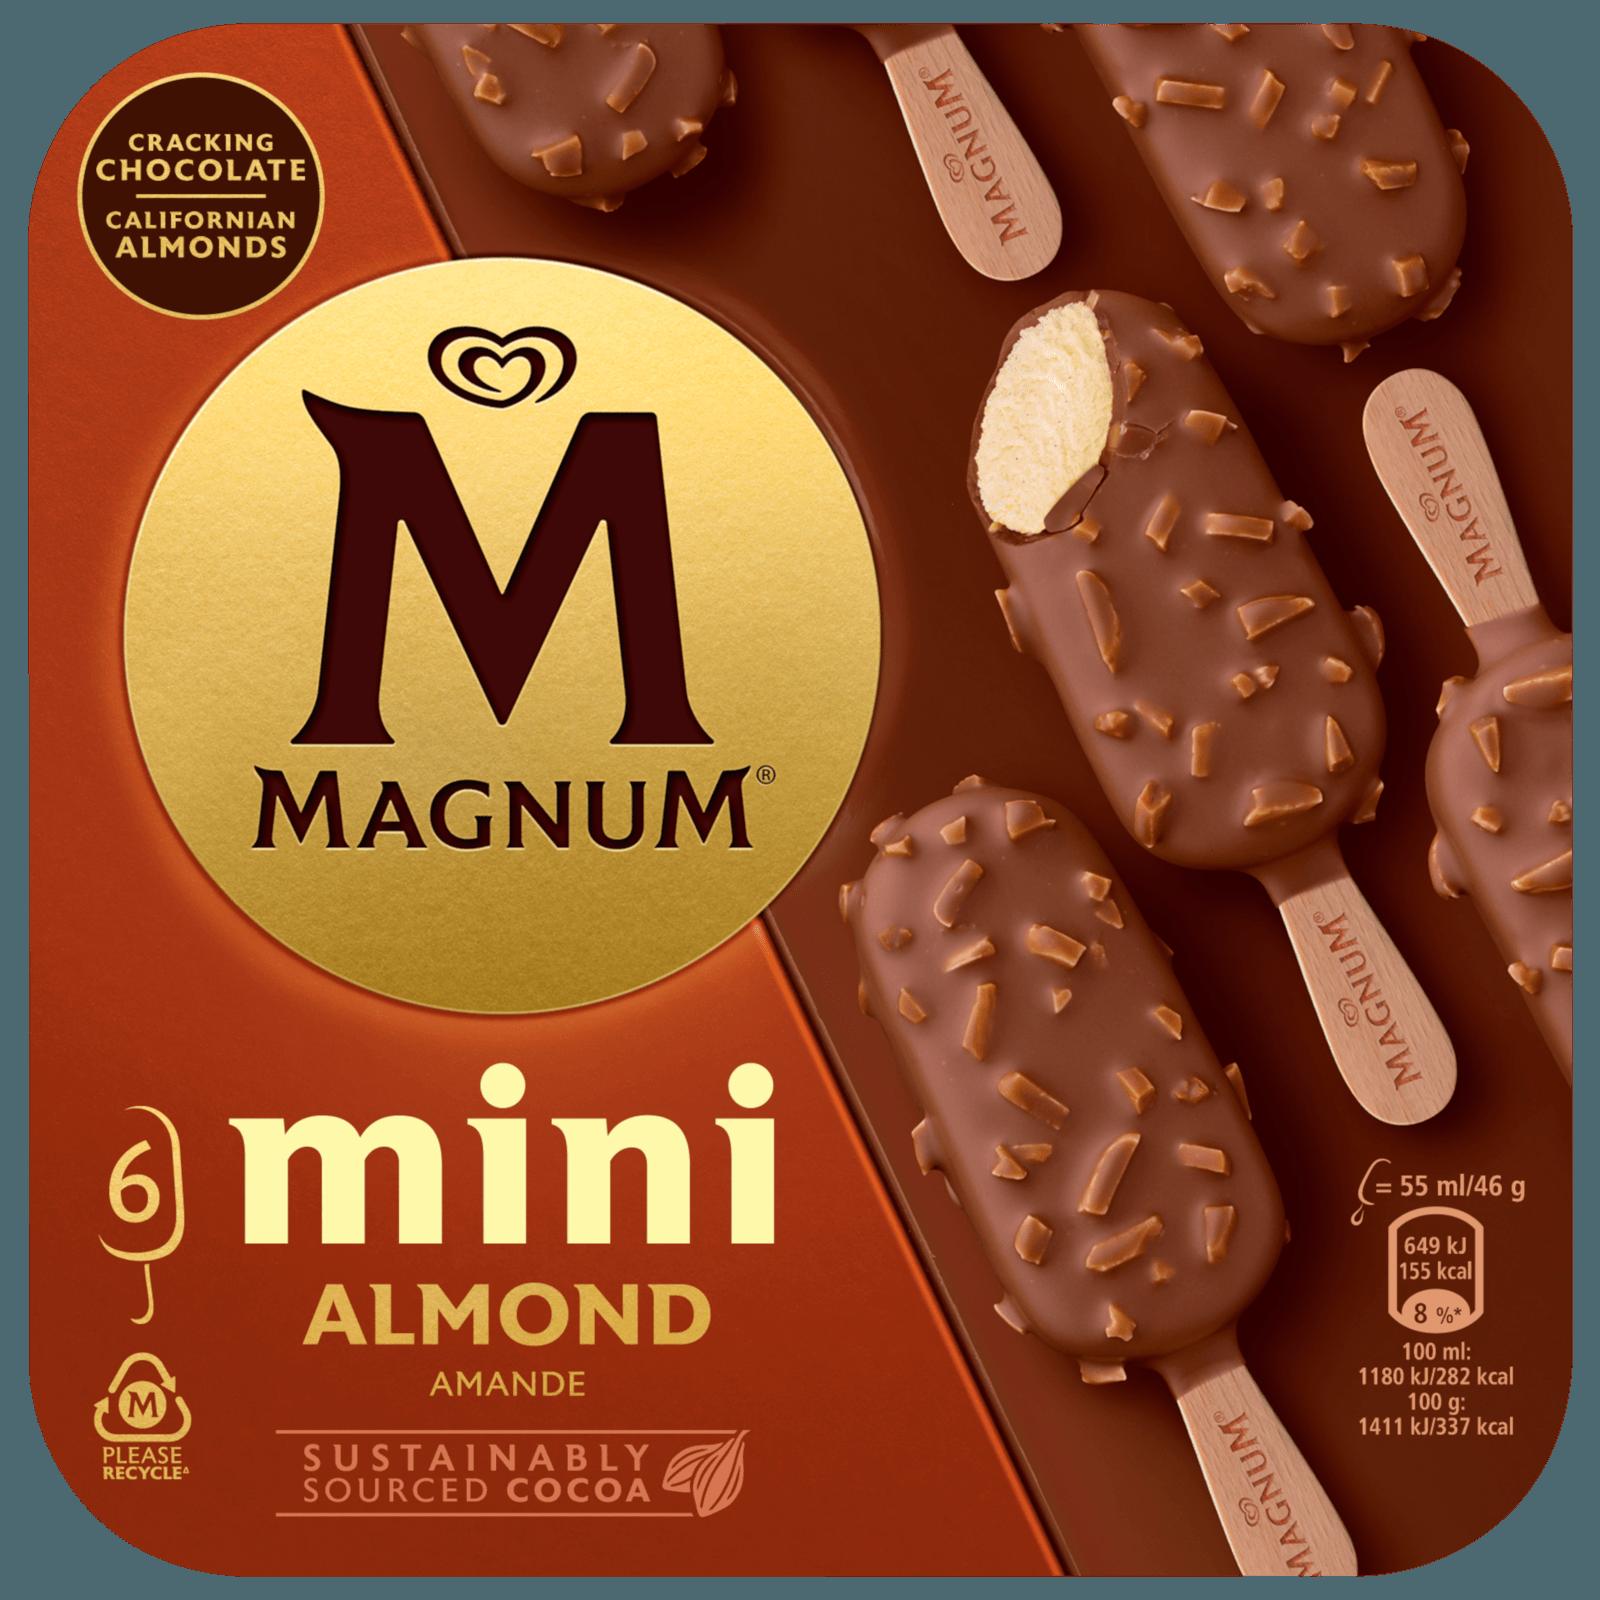 Magnum Mini Almond Familienpackung Eis 6 x 55 ml